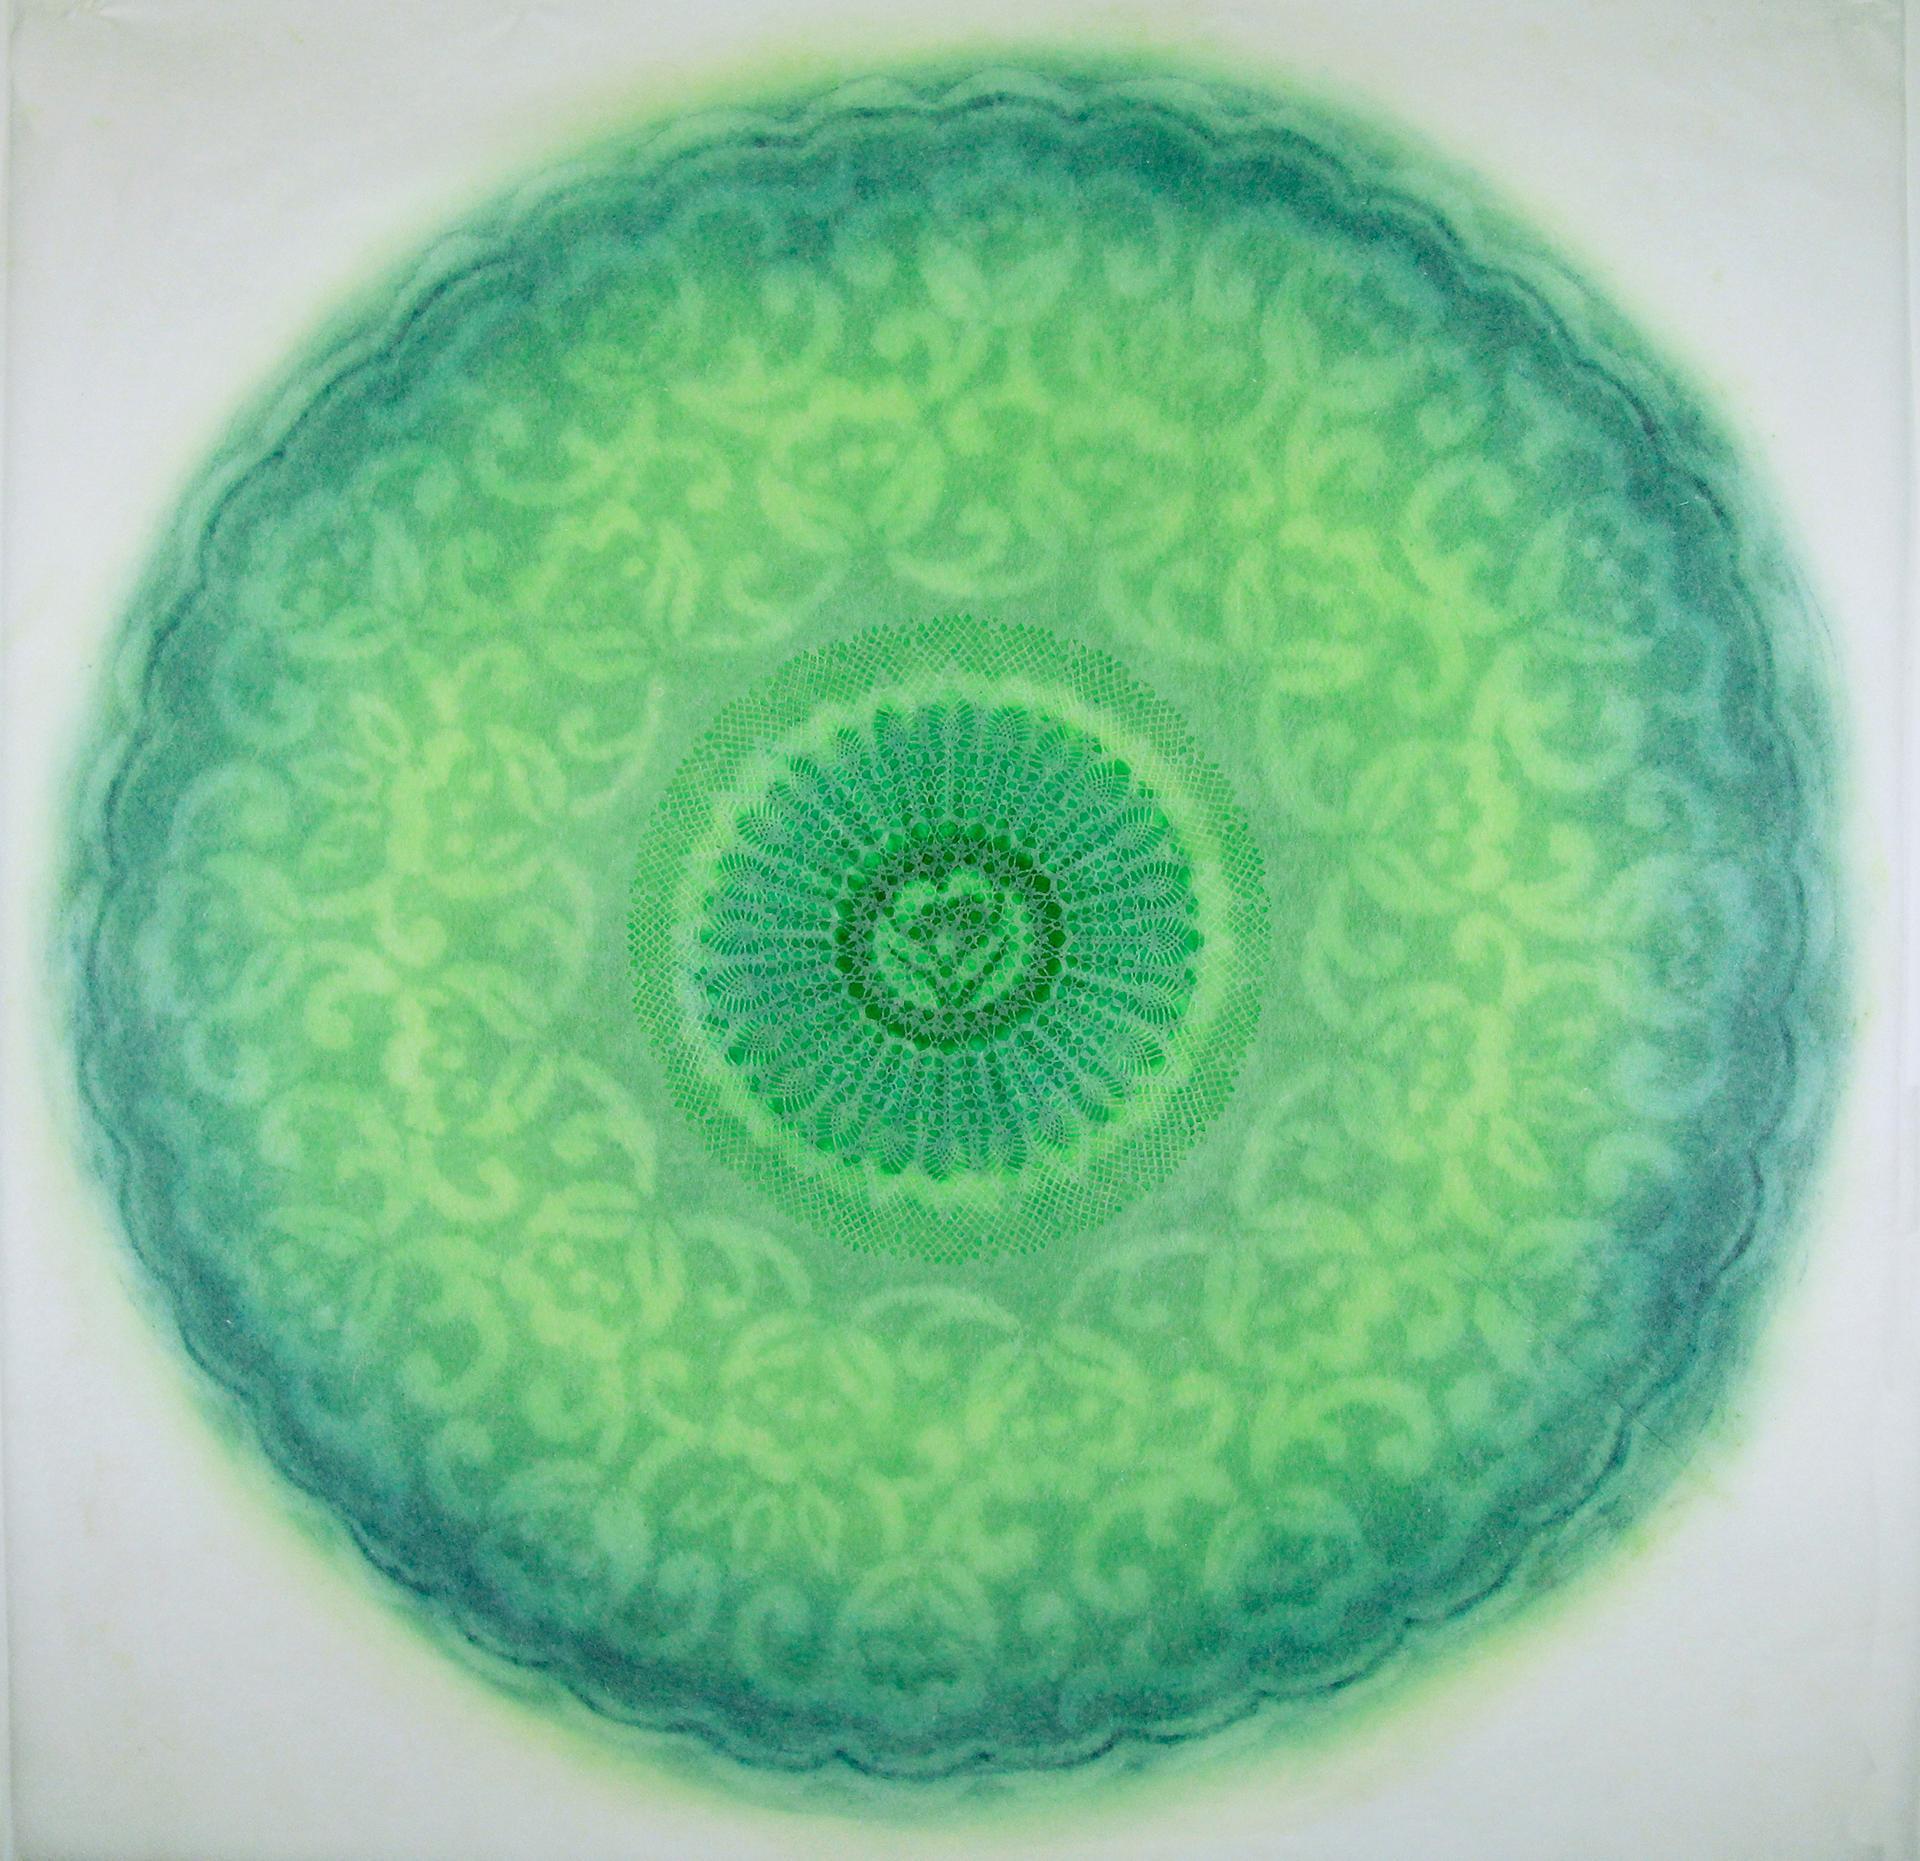 Revolution XXVII - green intricate lacey lasercut abstract geometric circle